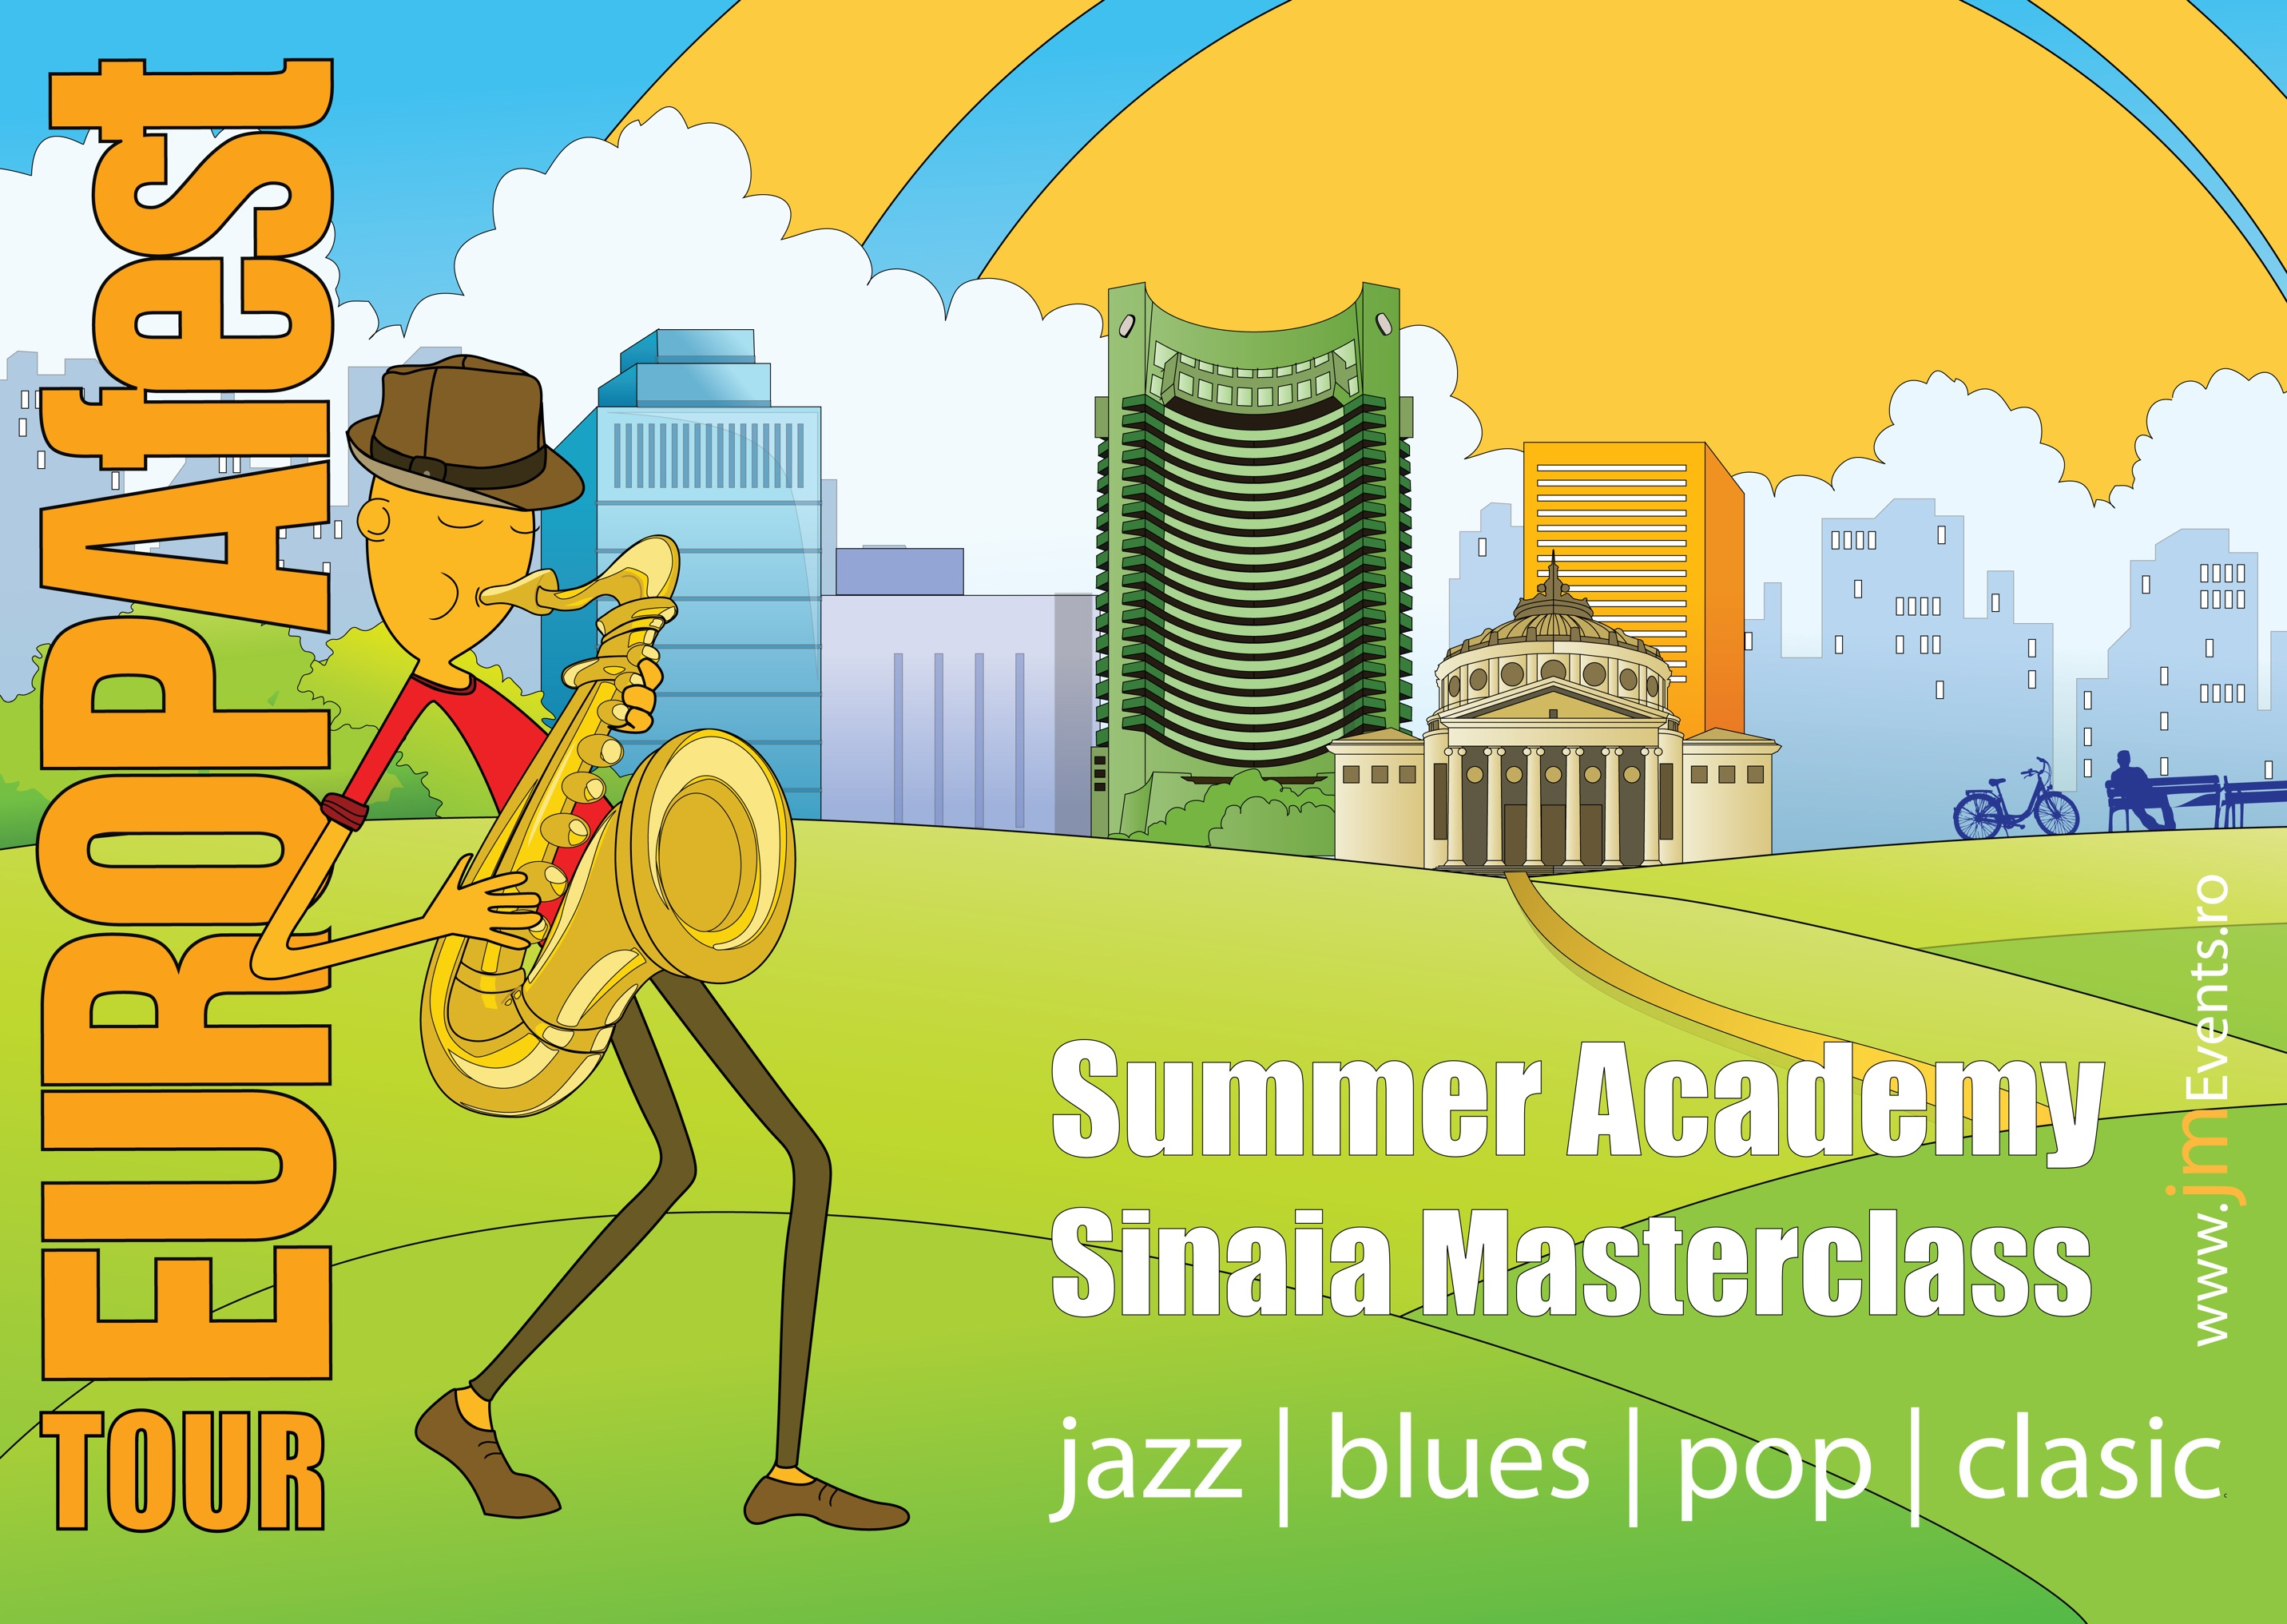 EUROPAfest Tour 2012 – Summer Academy la Sinaia